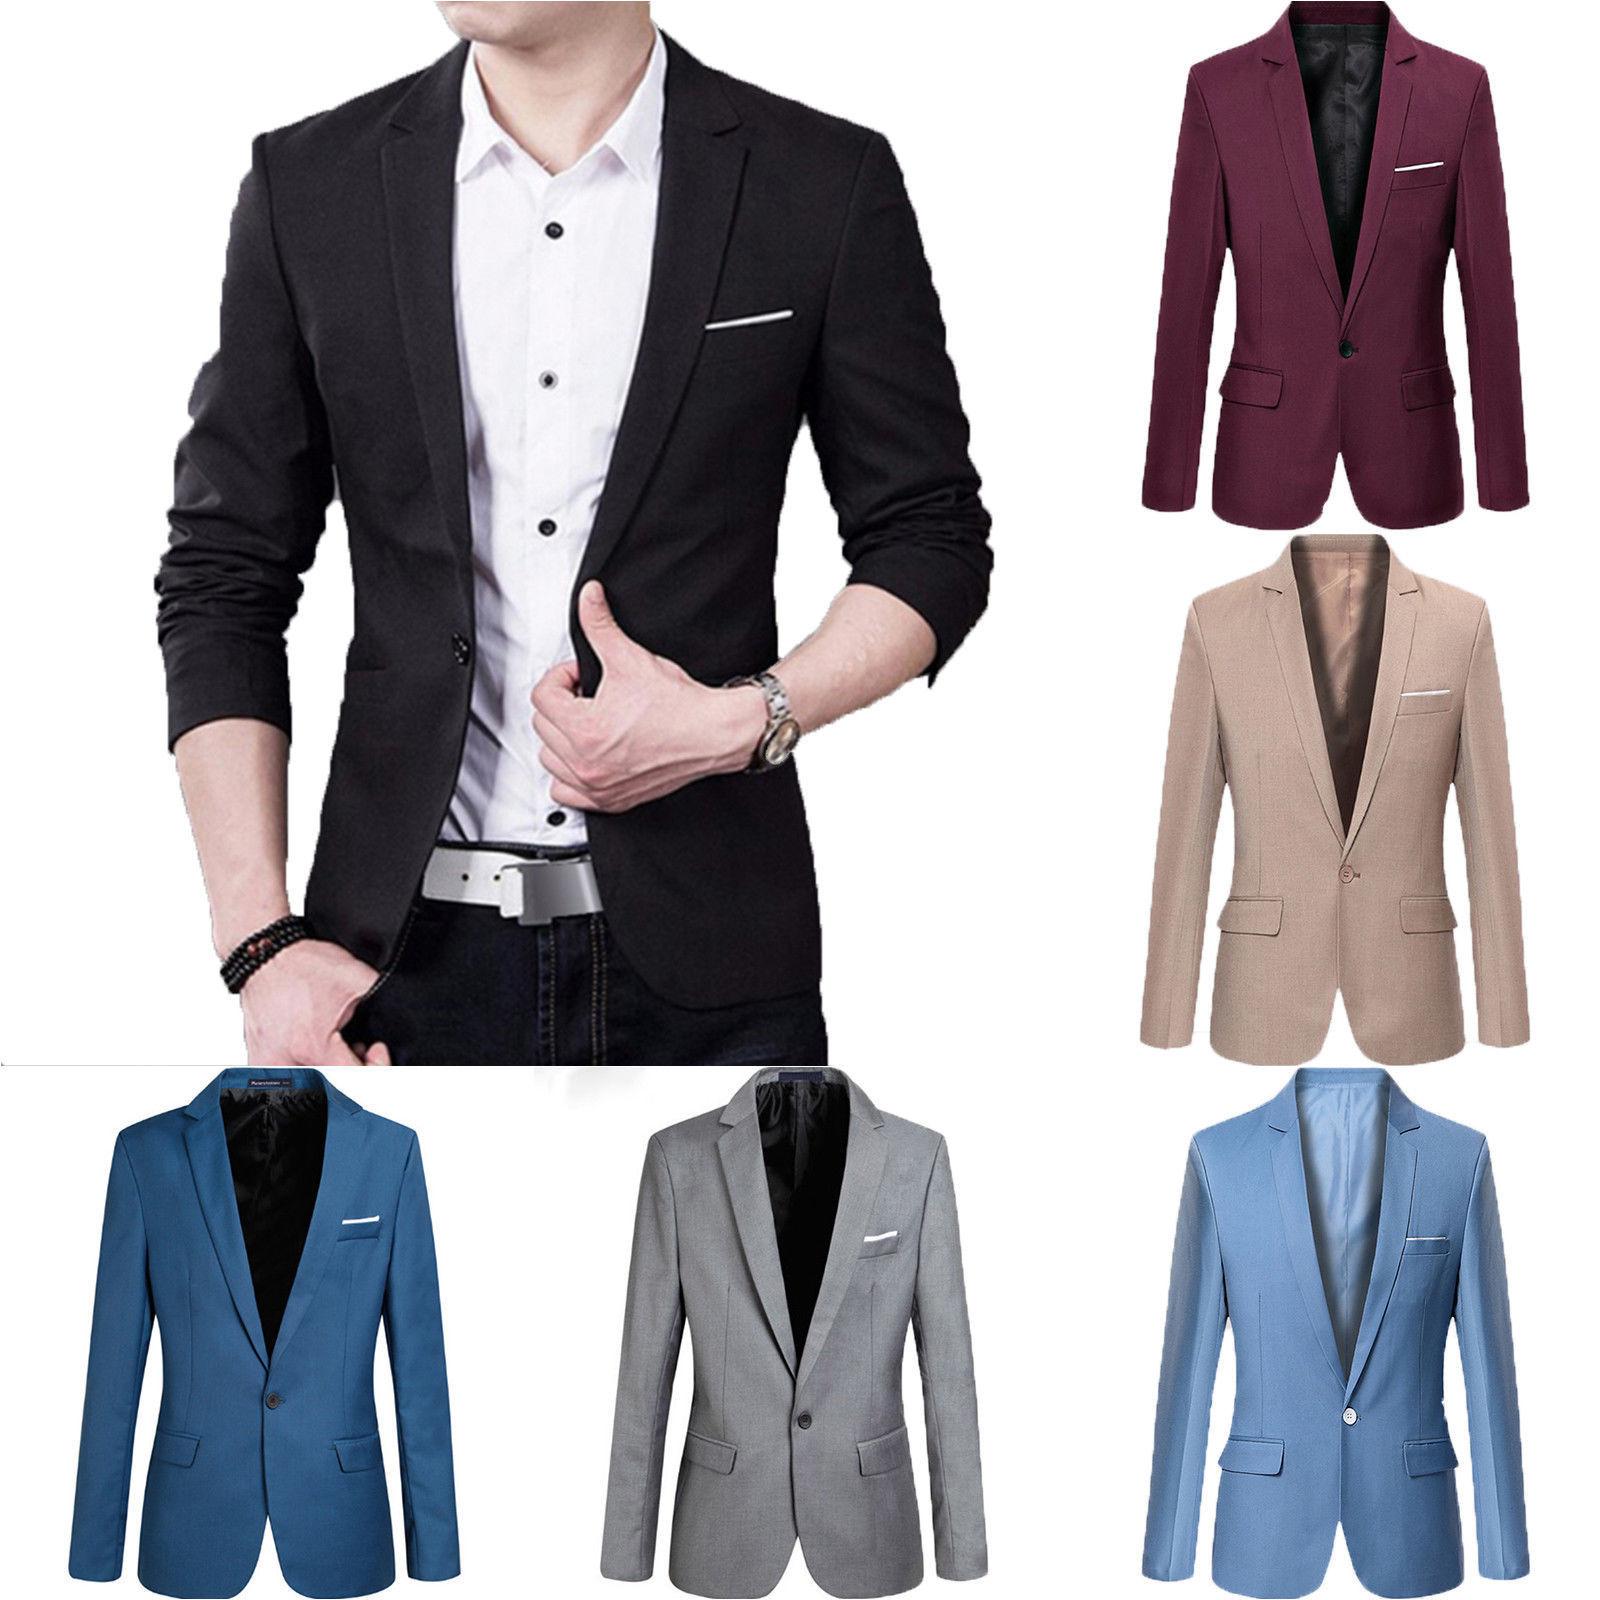 Hot Sale Fashion Men Casual Solid Slim Fit Formal One Button Suit Blazer Coat Jacket Blazer